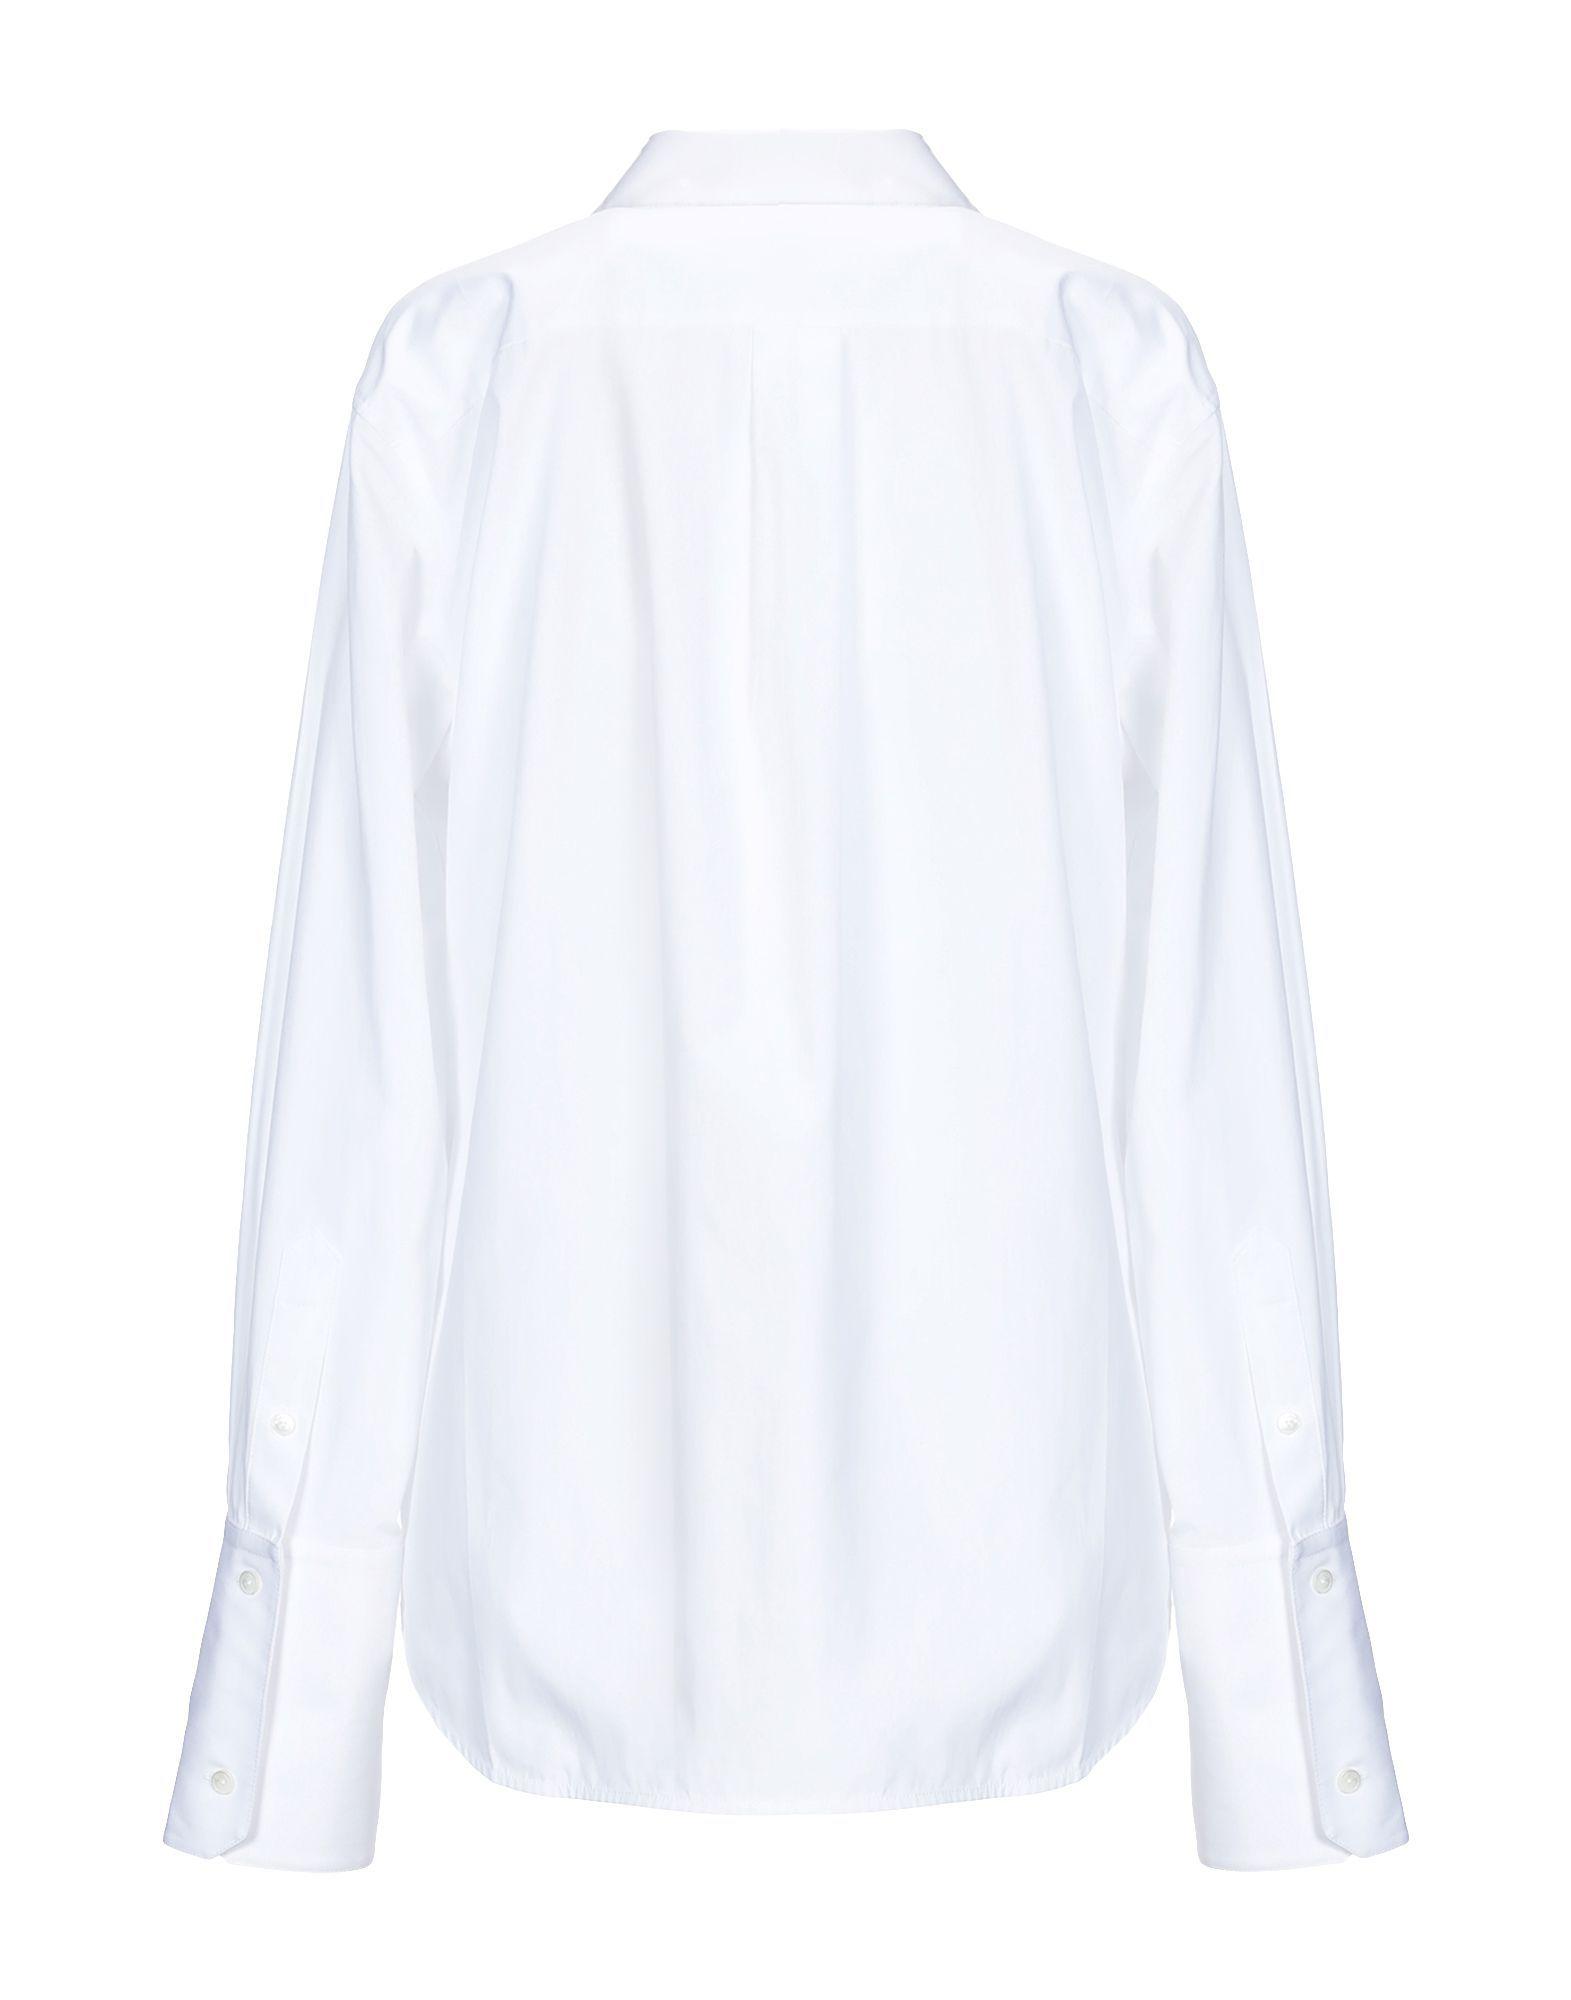 Helmut Lang White Cotton Shirt